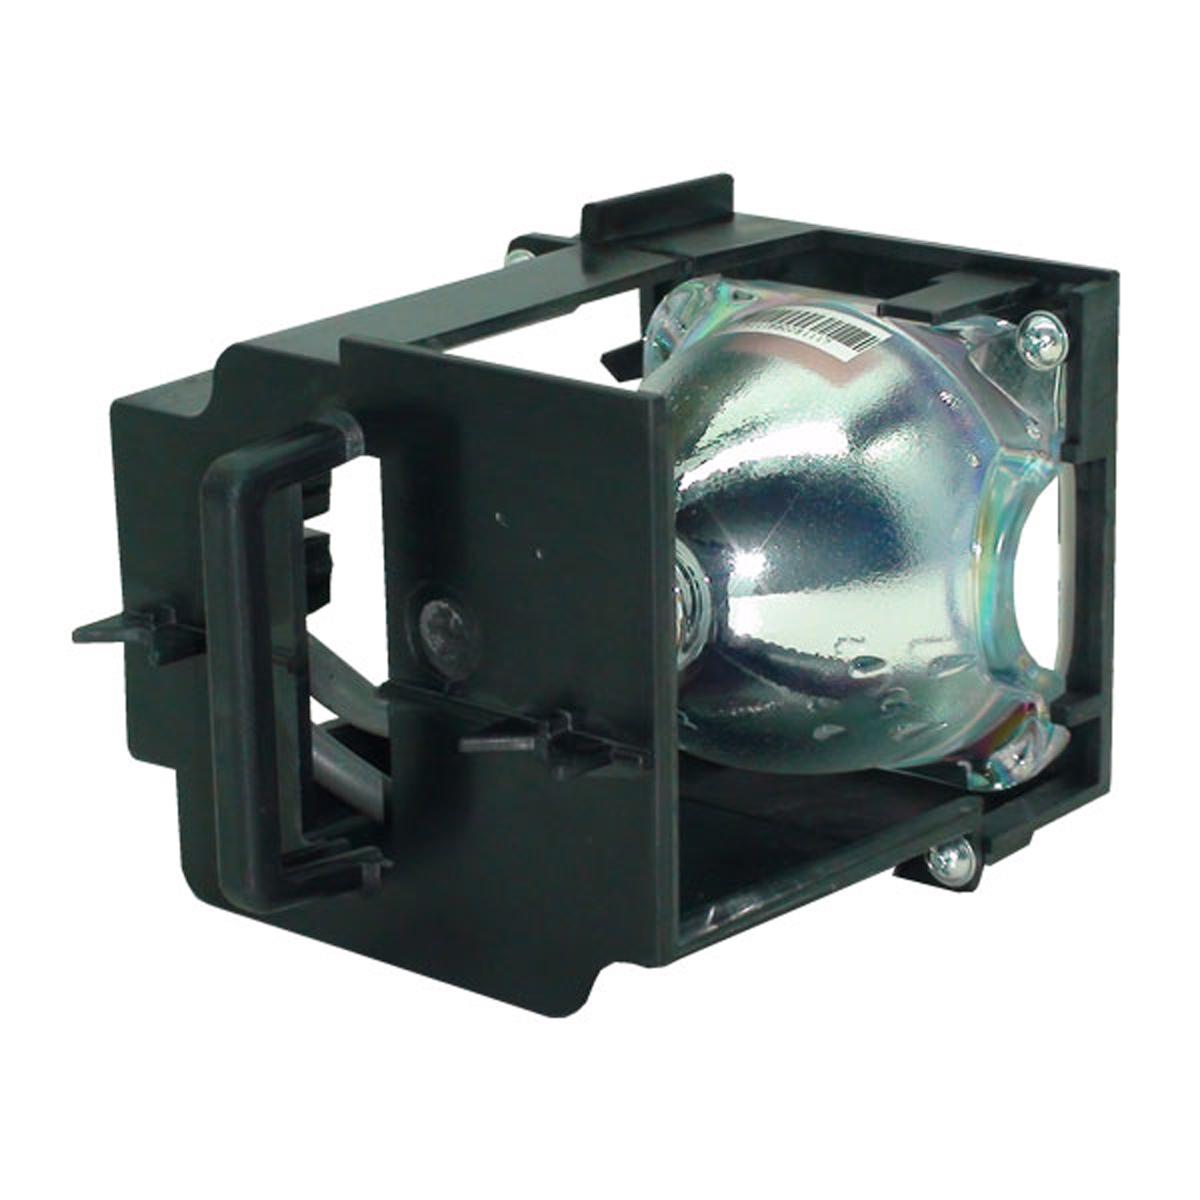 bp96 01795a bulb cartridge for samsung hlt5076sx tv lamp rptv bulbs. Black Bedroom Furniture Sets. Home Design Ideas